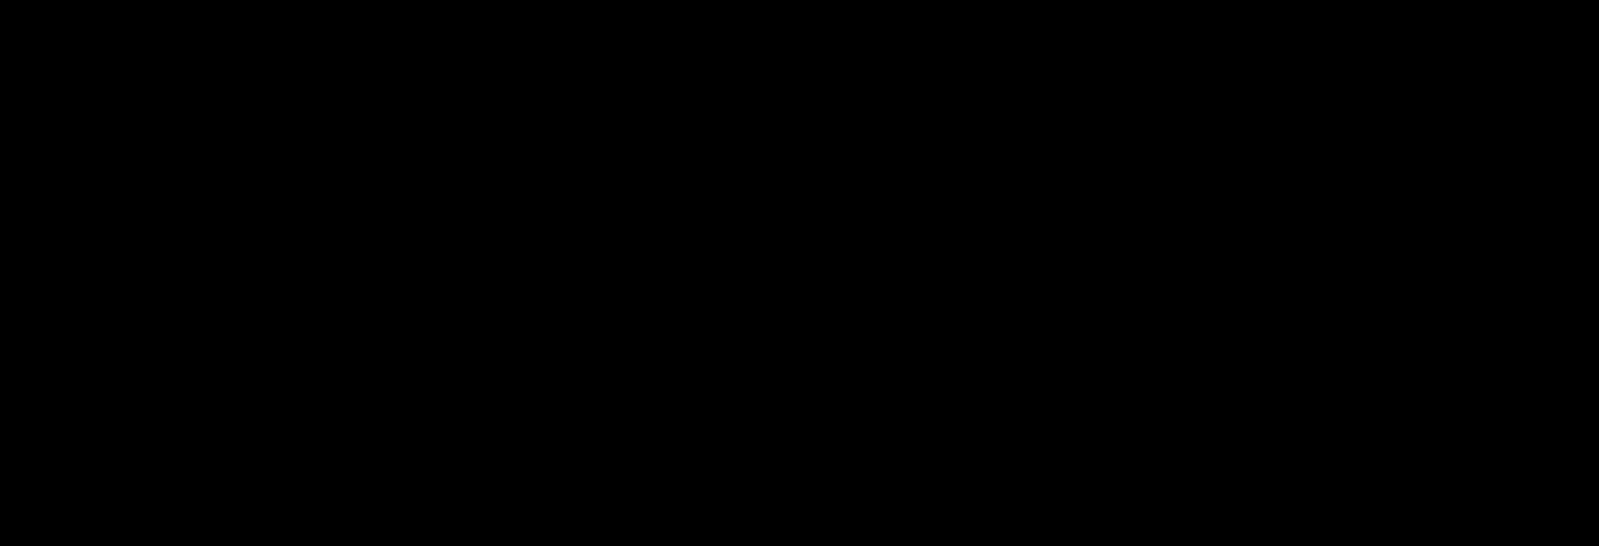 ec choice - tagline